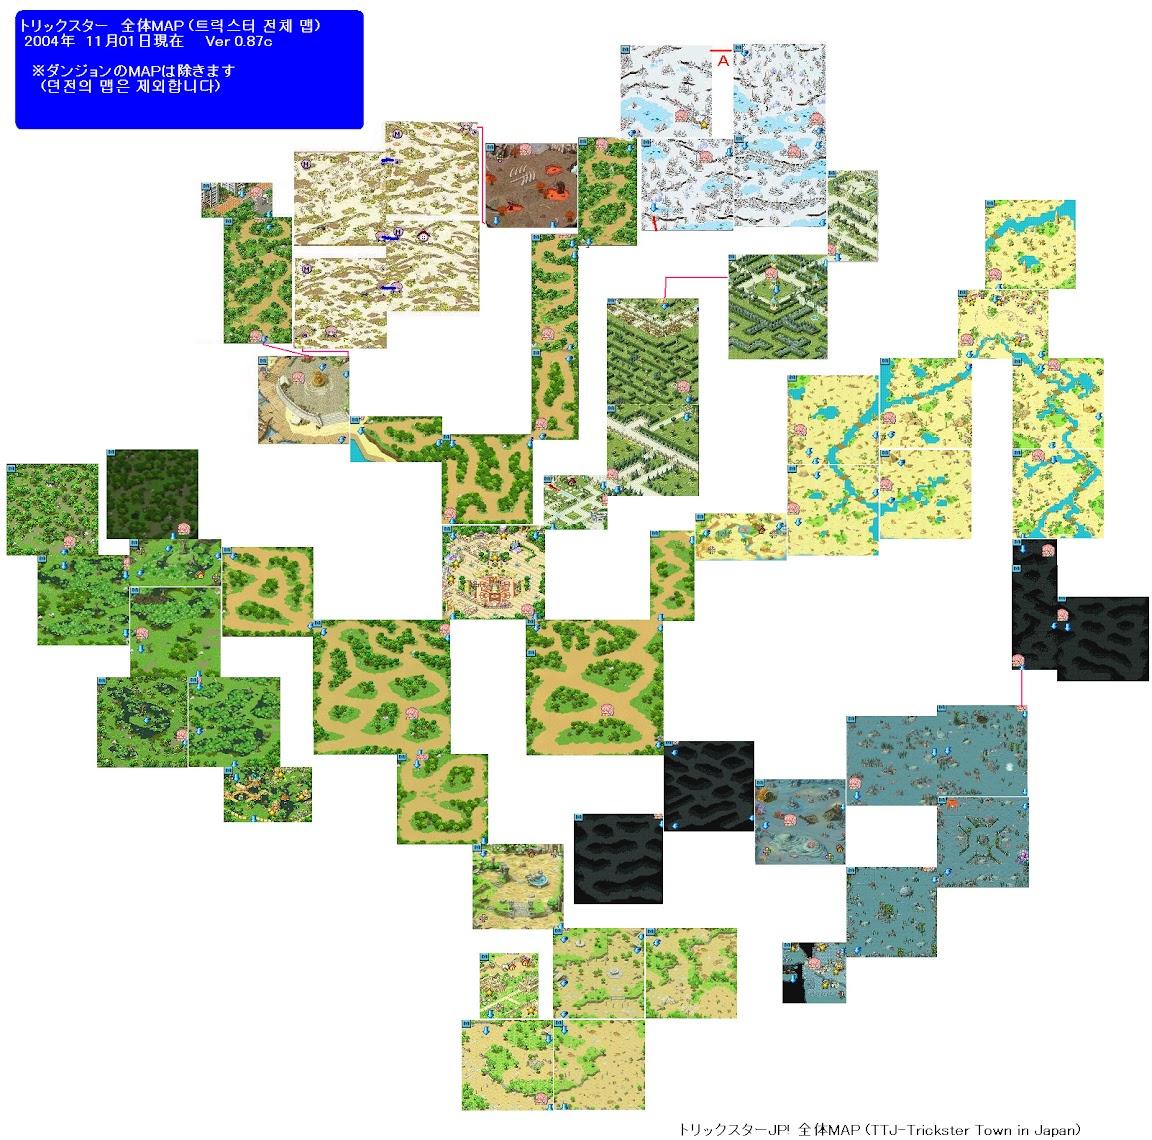 https://lh5.googleusercontent.com/_z-G5Yx1eAxs/TcEMolktKfI/AAAAAAAAY8U/Q26Woj40Iog/s1152/hp_map.jpg